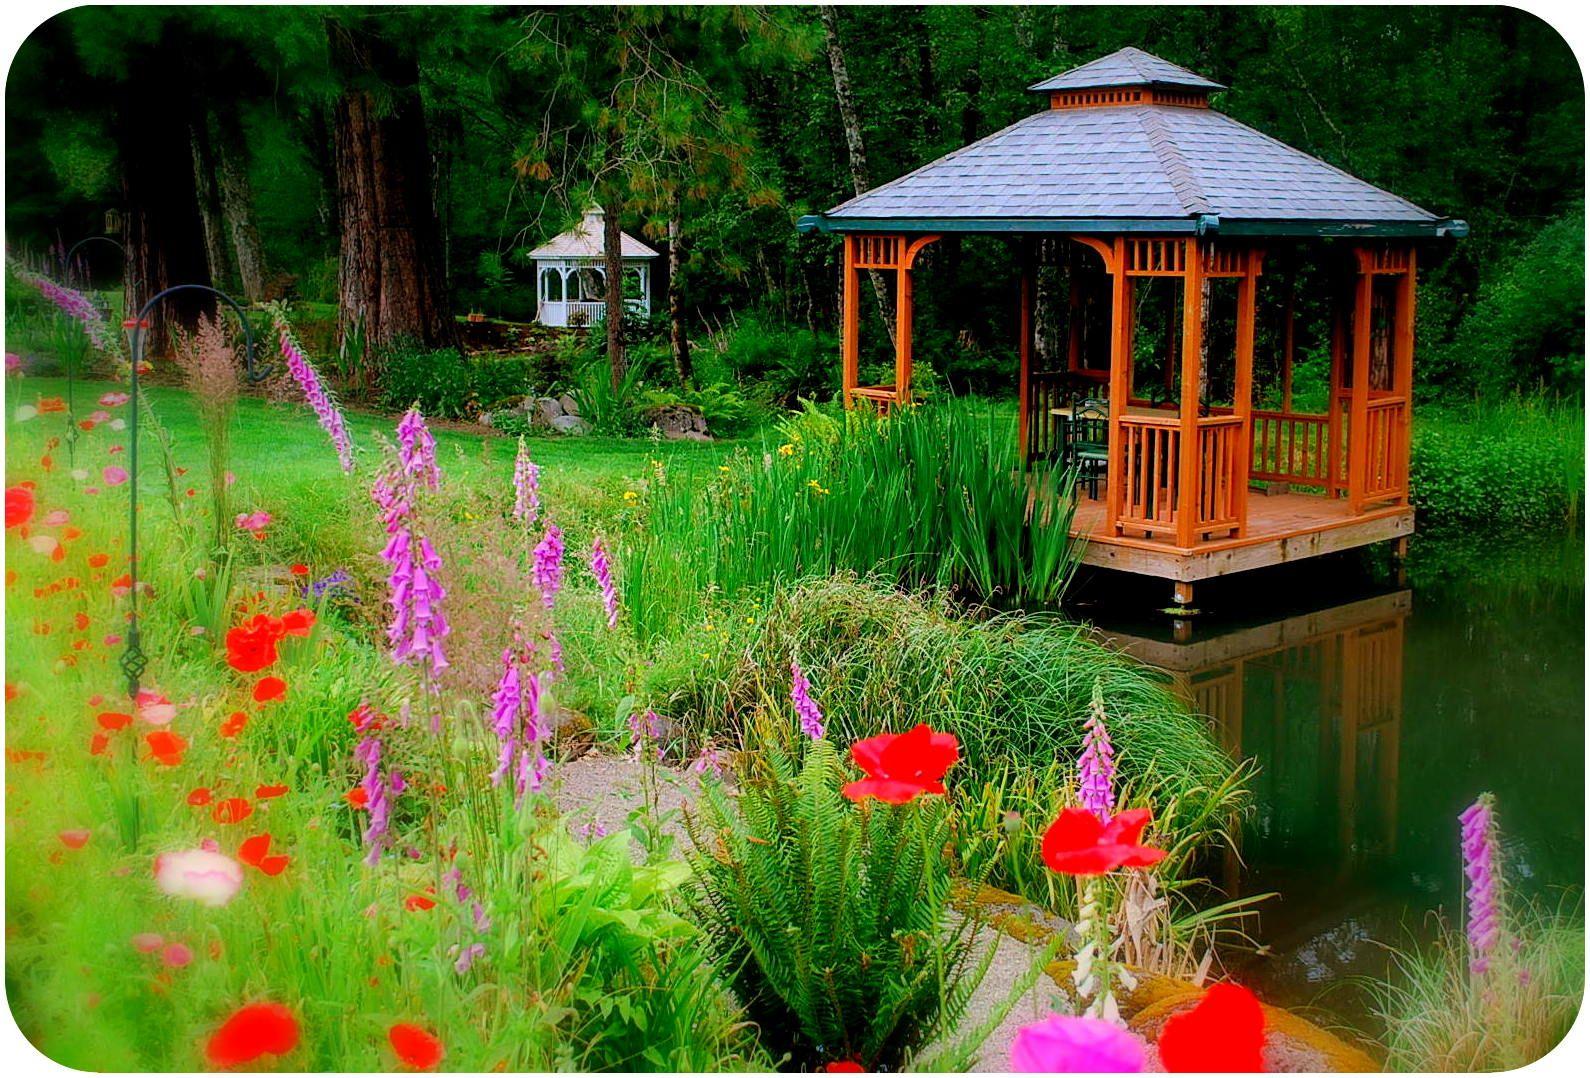 Outdoor Wedding Venues, Garden Events - Knollcrest Gardens ...